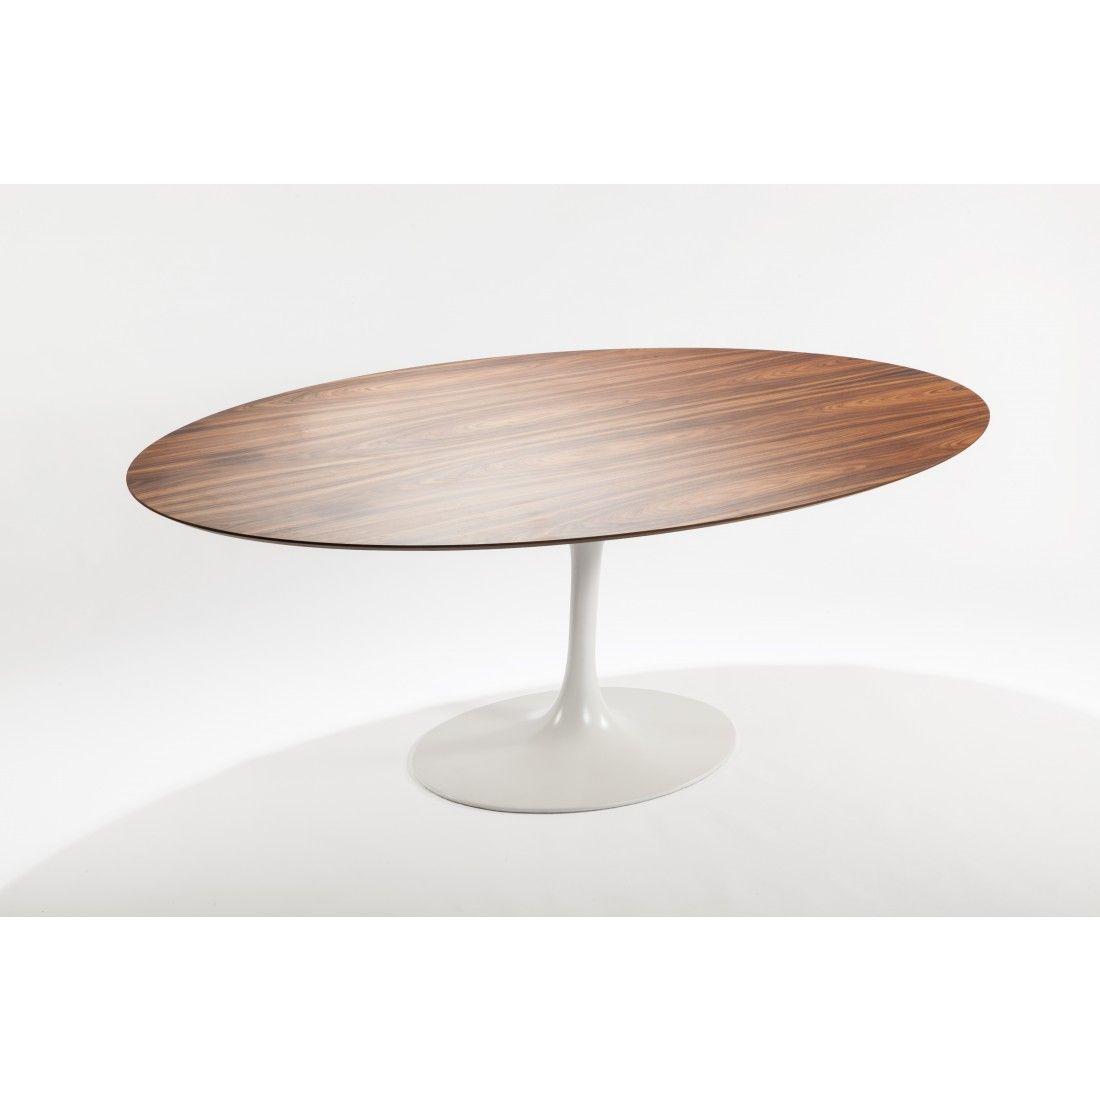 Tulip Dining Table Oval Walnut Veneer Walnut Veneer And Room - Walnut tulip dining table